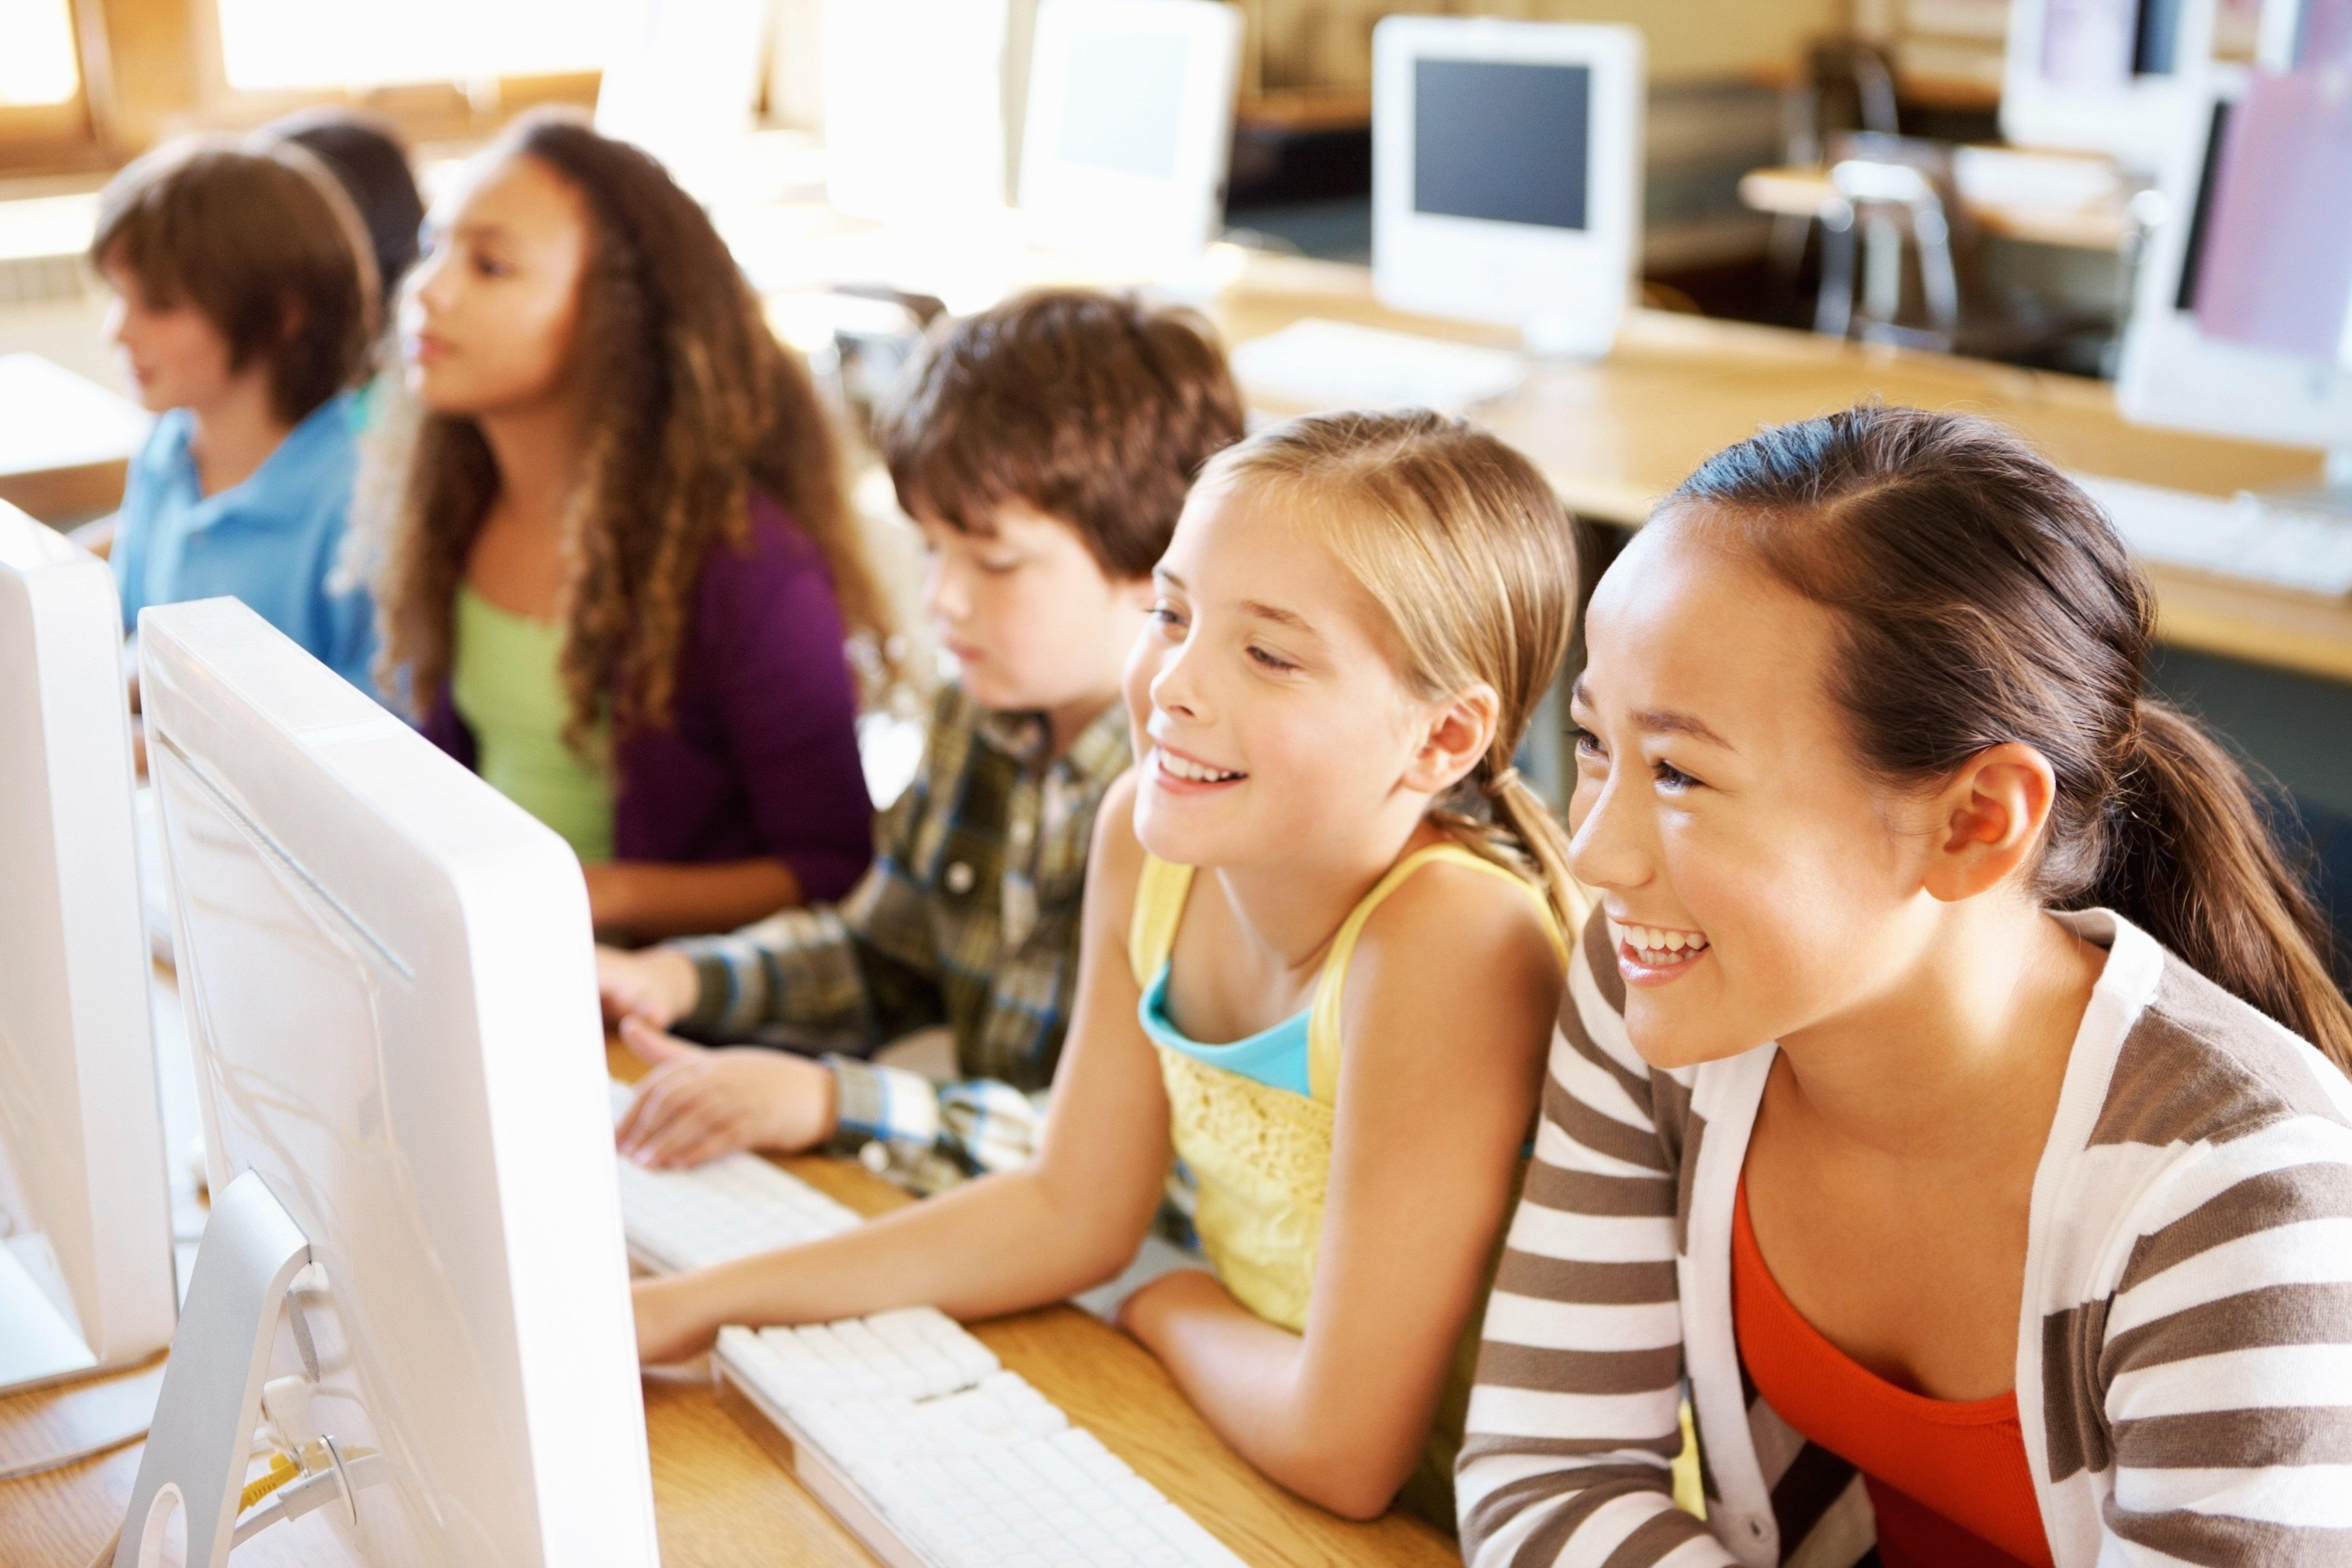 PRIVO Student Digital Privacy